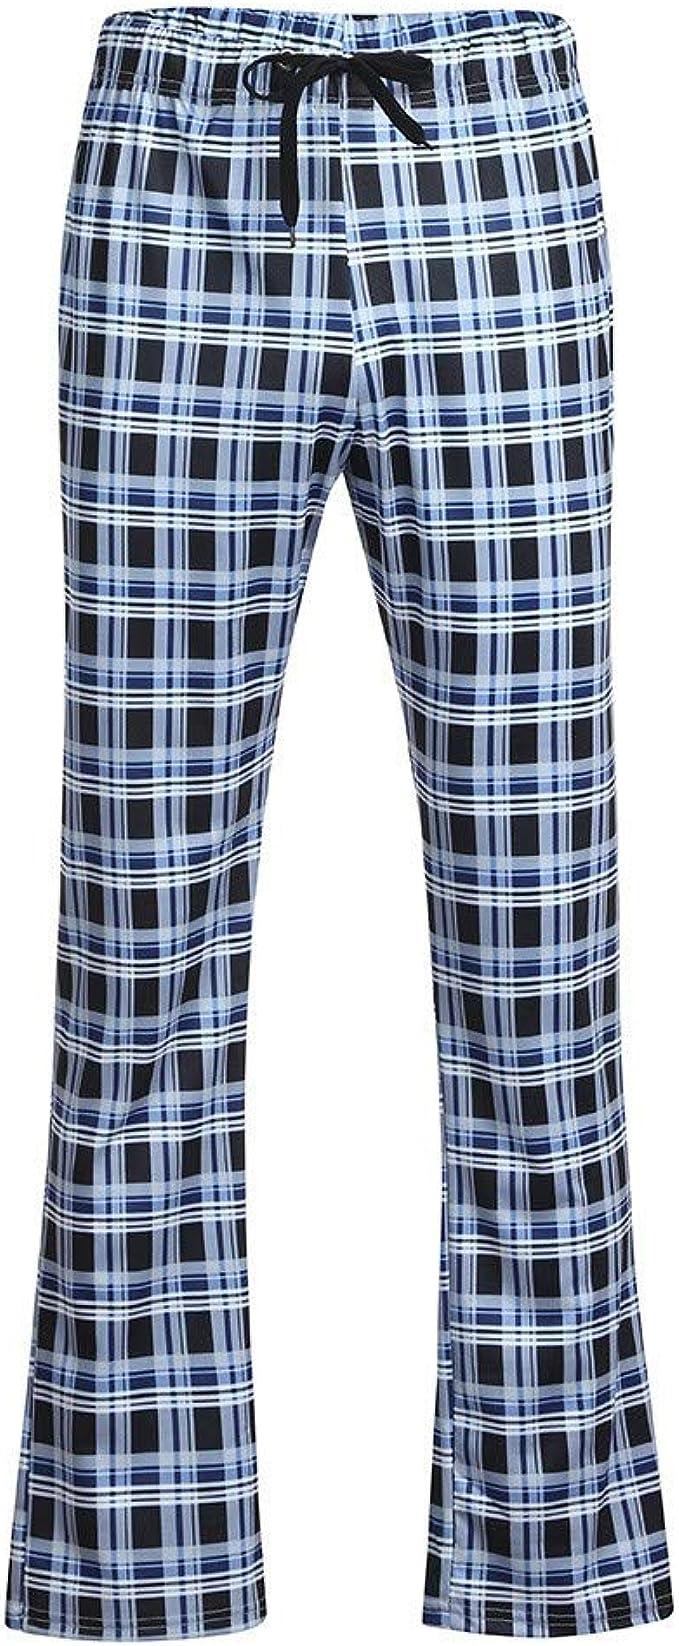 Pantalones para Hombre, Pantalones de Pijama Moda Pop Casuales ...